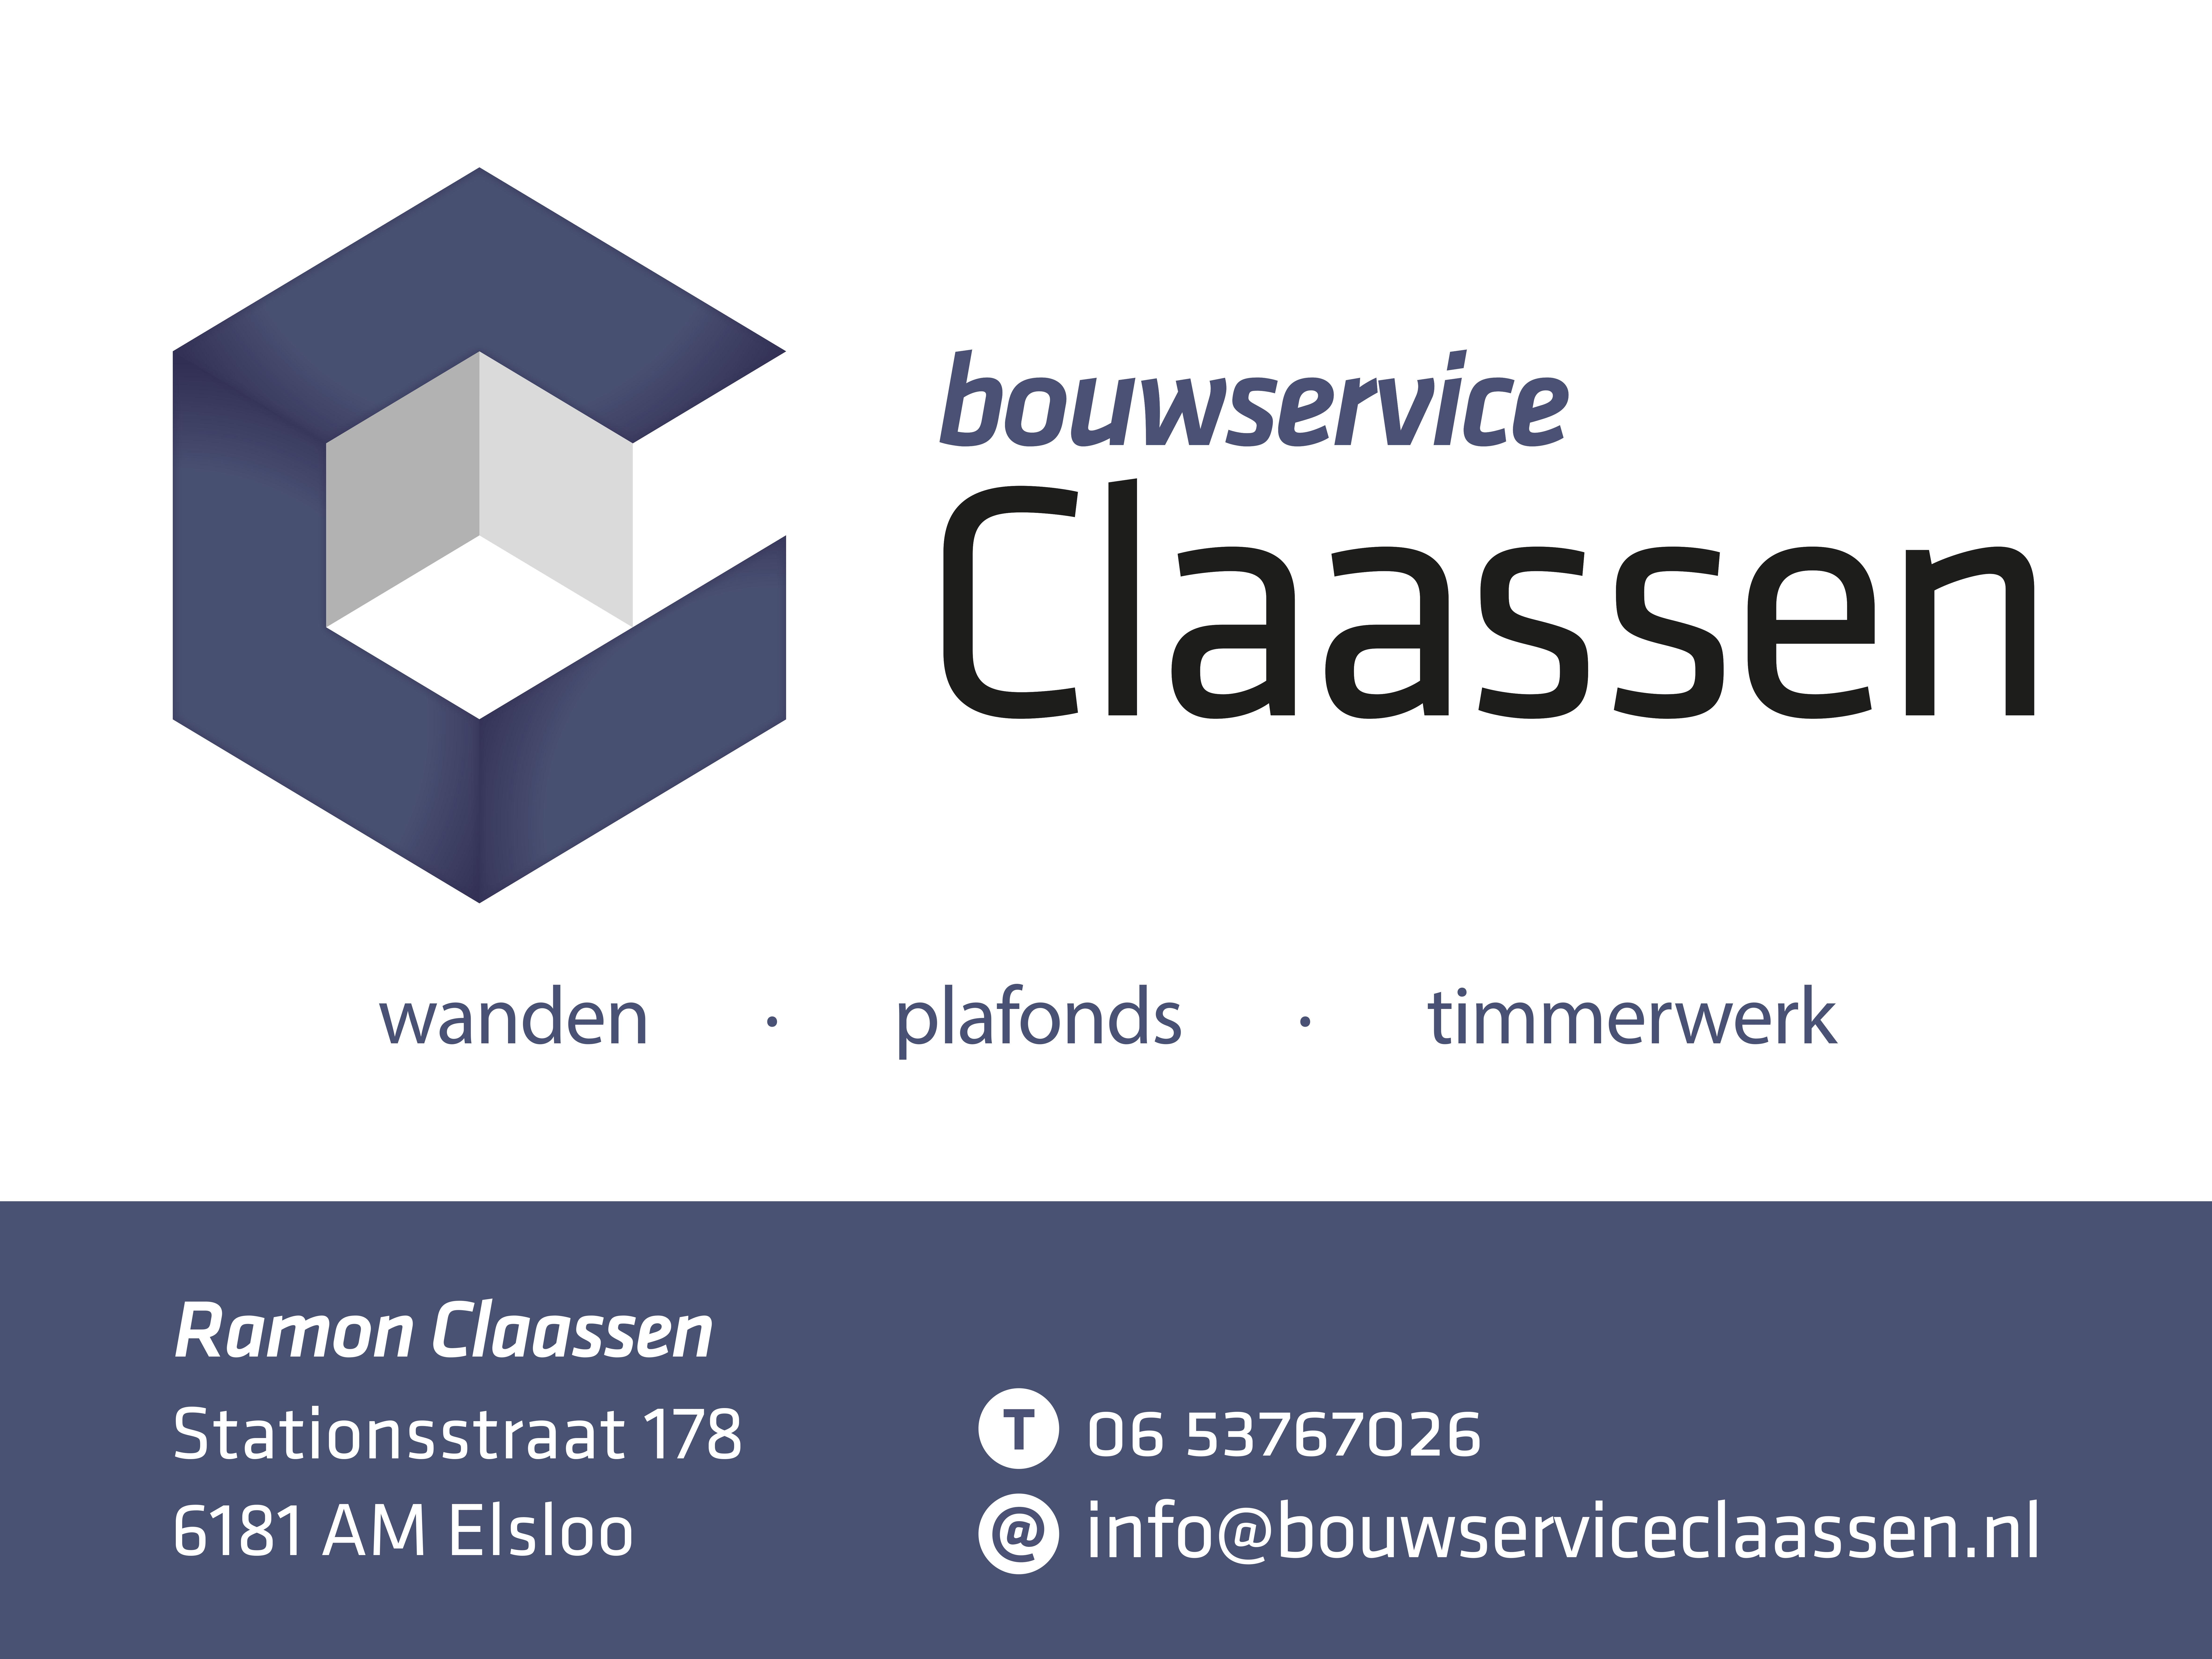 Bouwservice Claassen